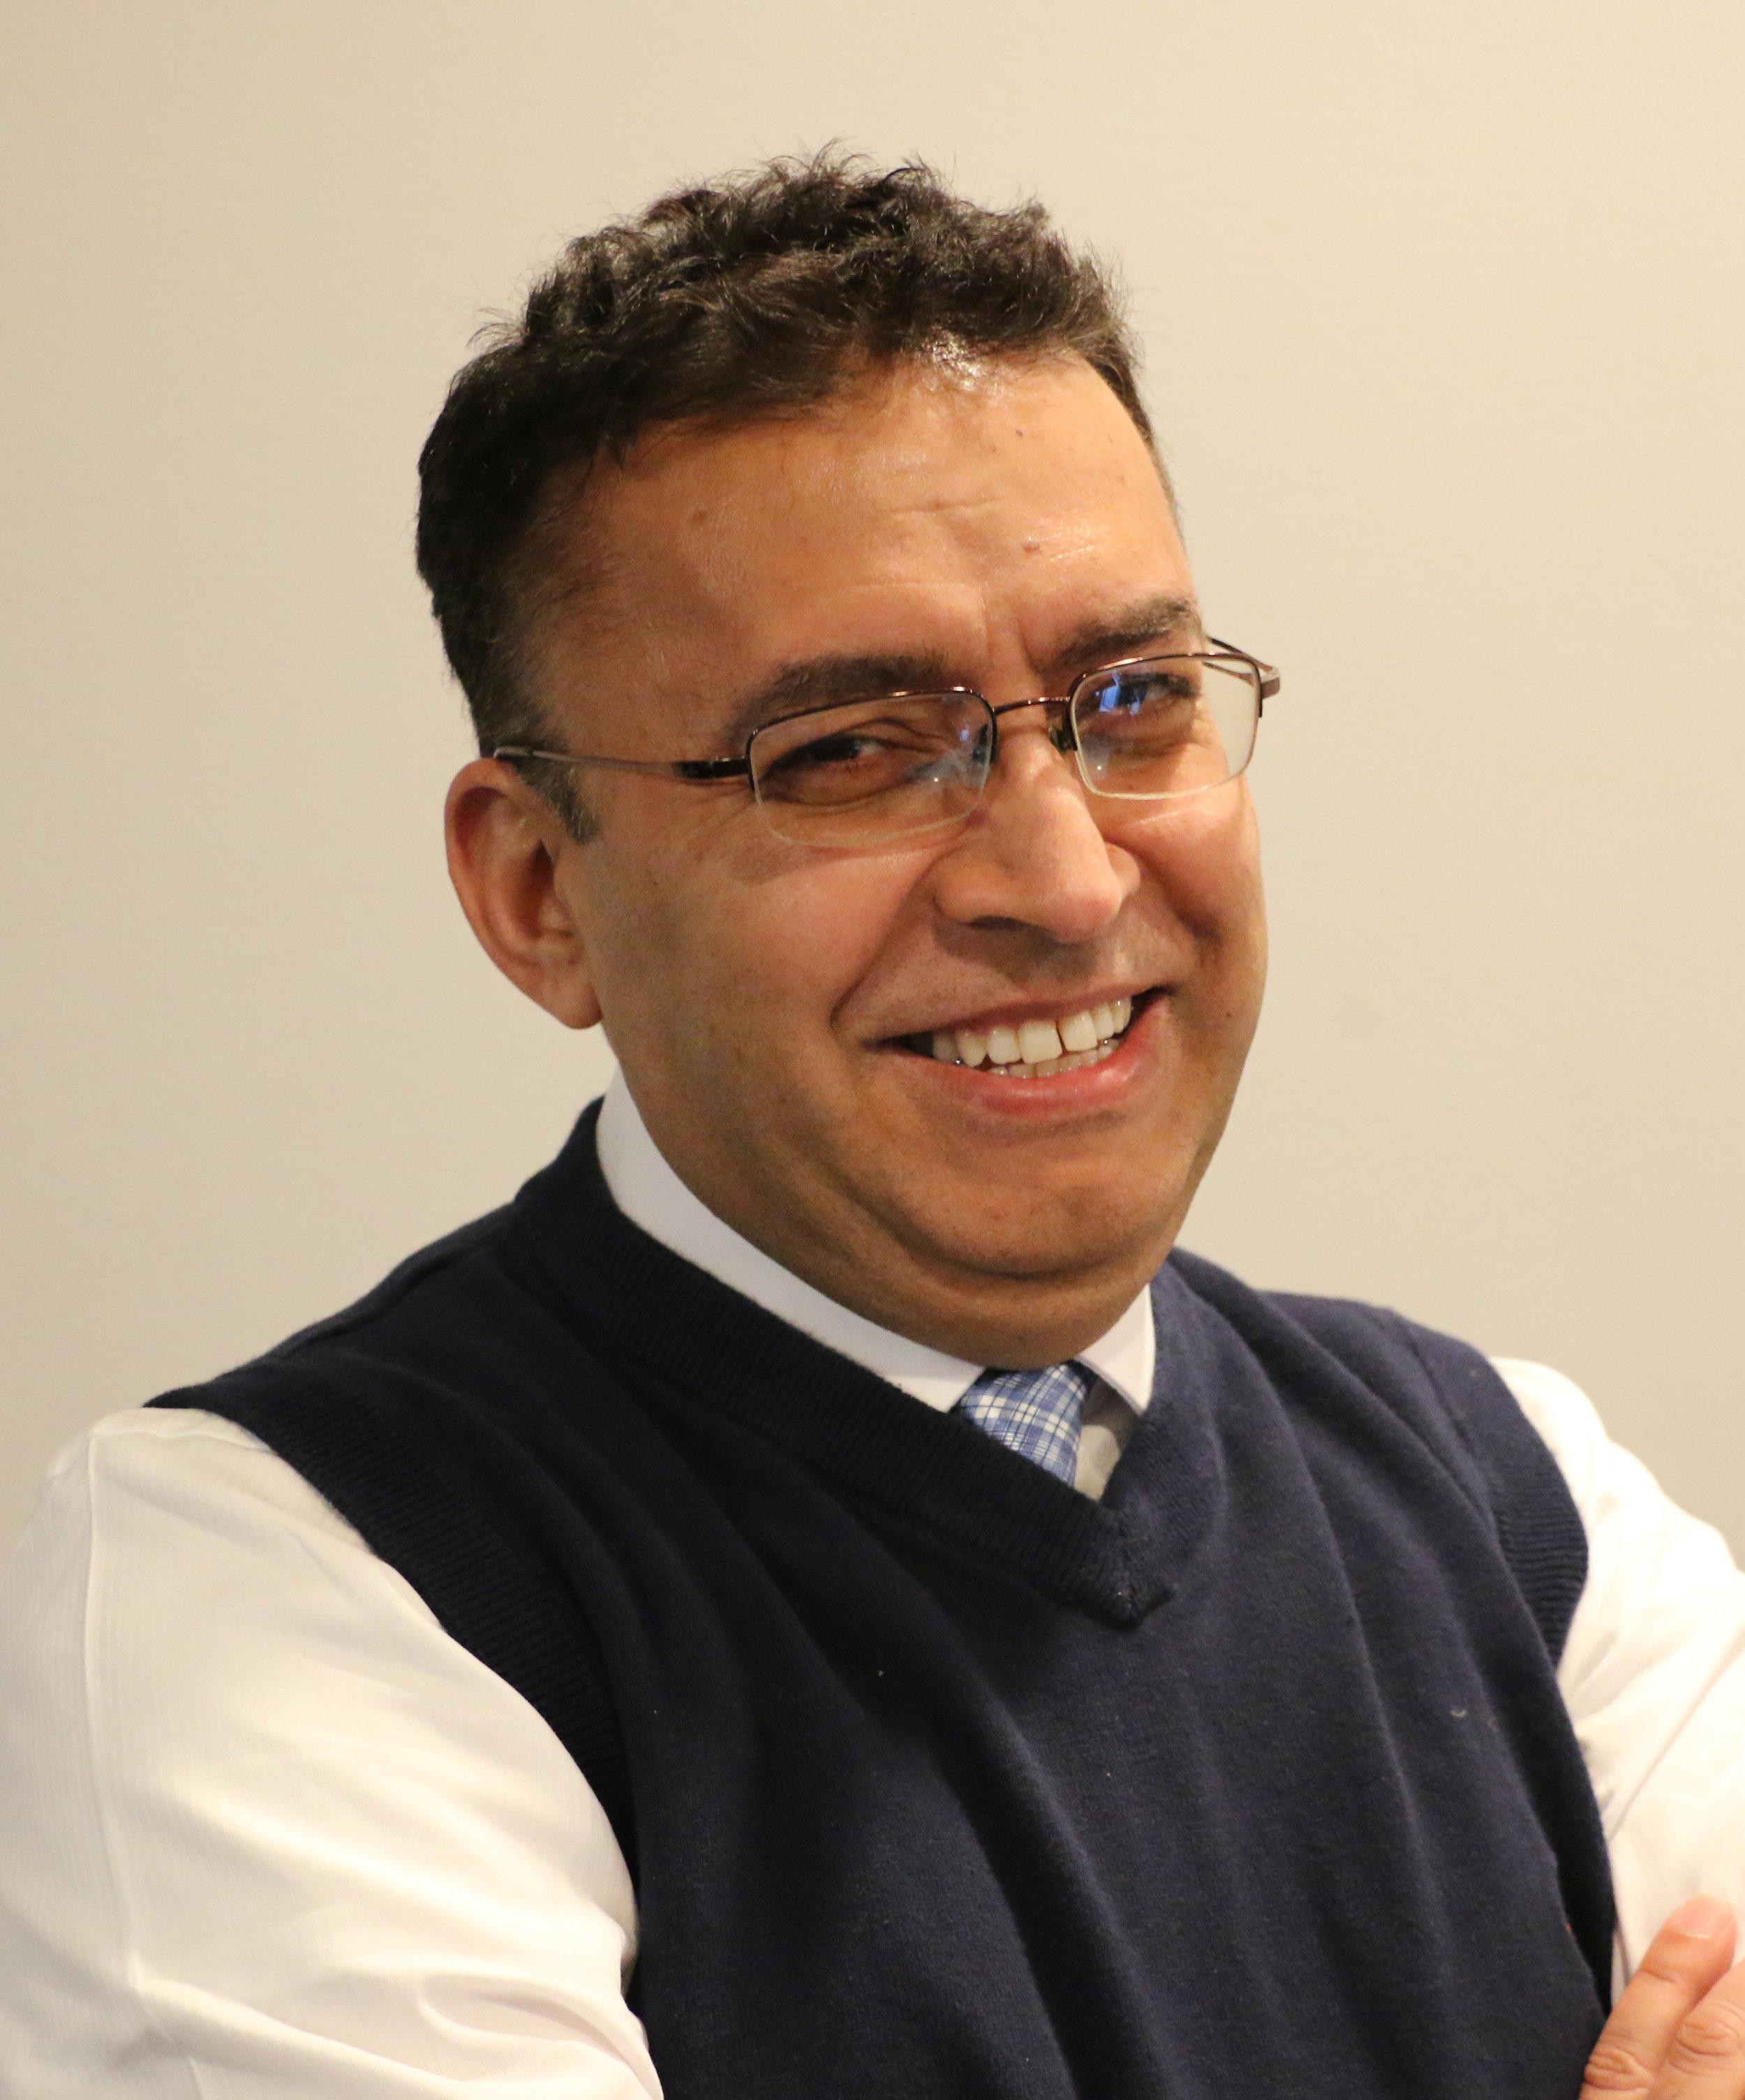 RAJ ADHIKARI, PRMG RESTON BRANCH MANAGER